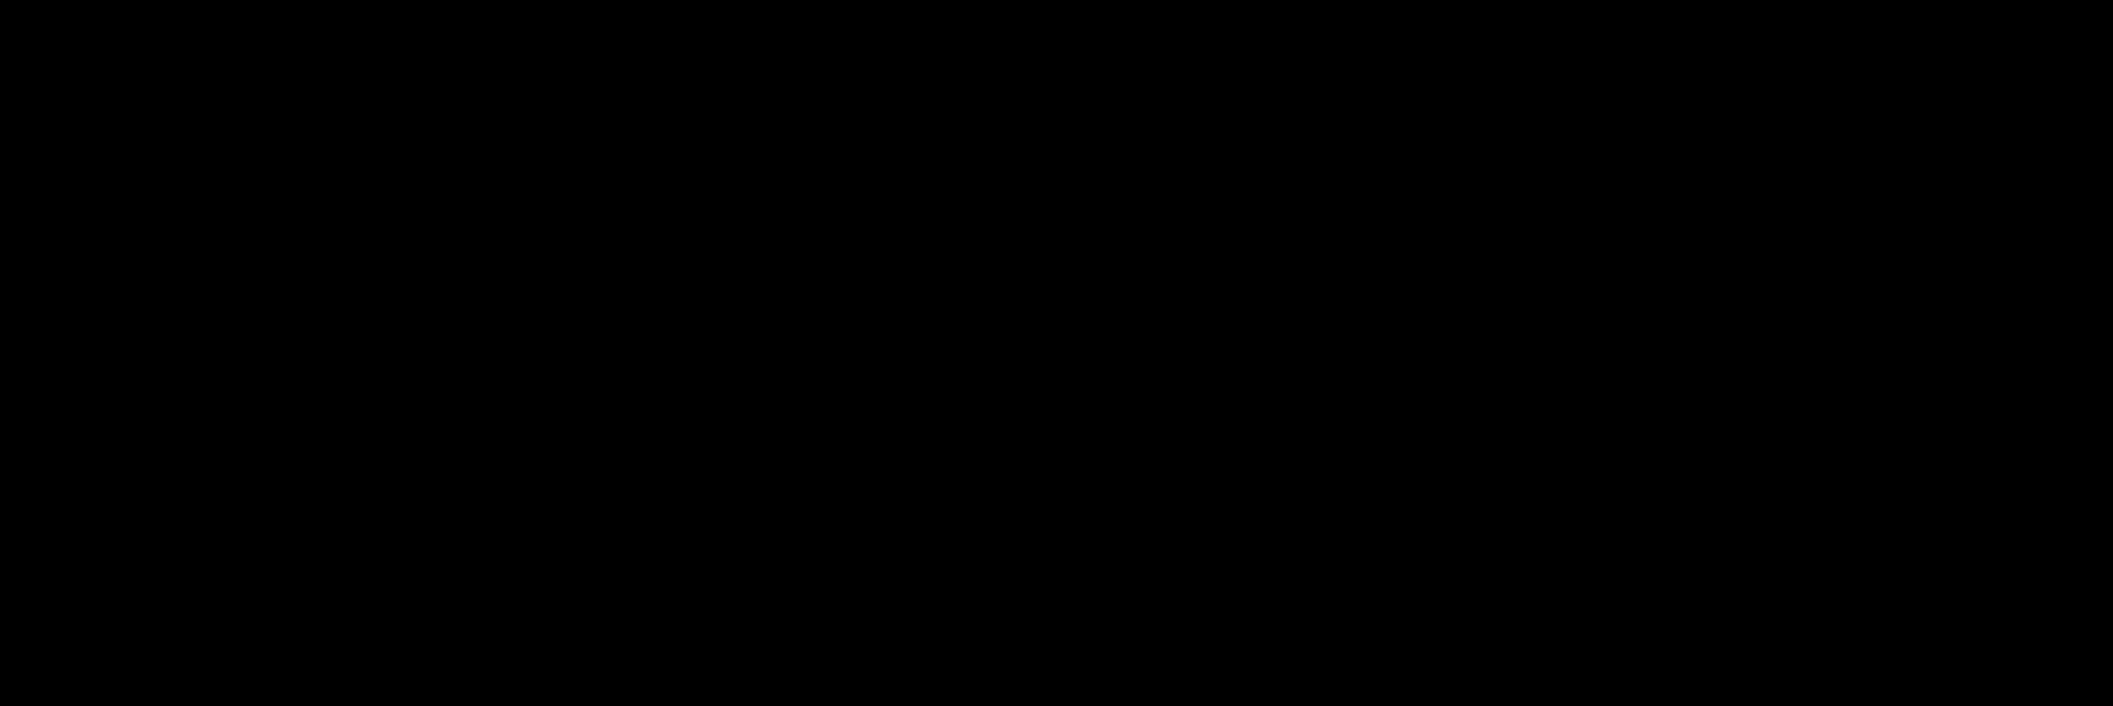 Entinostat-d<sub>6</sub>